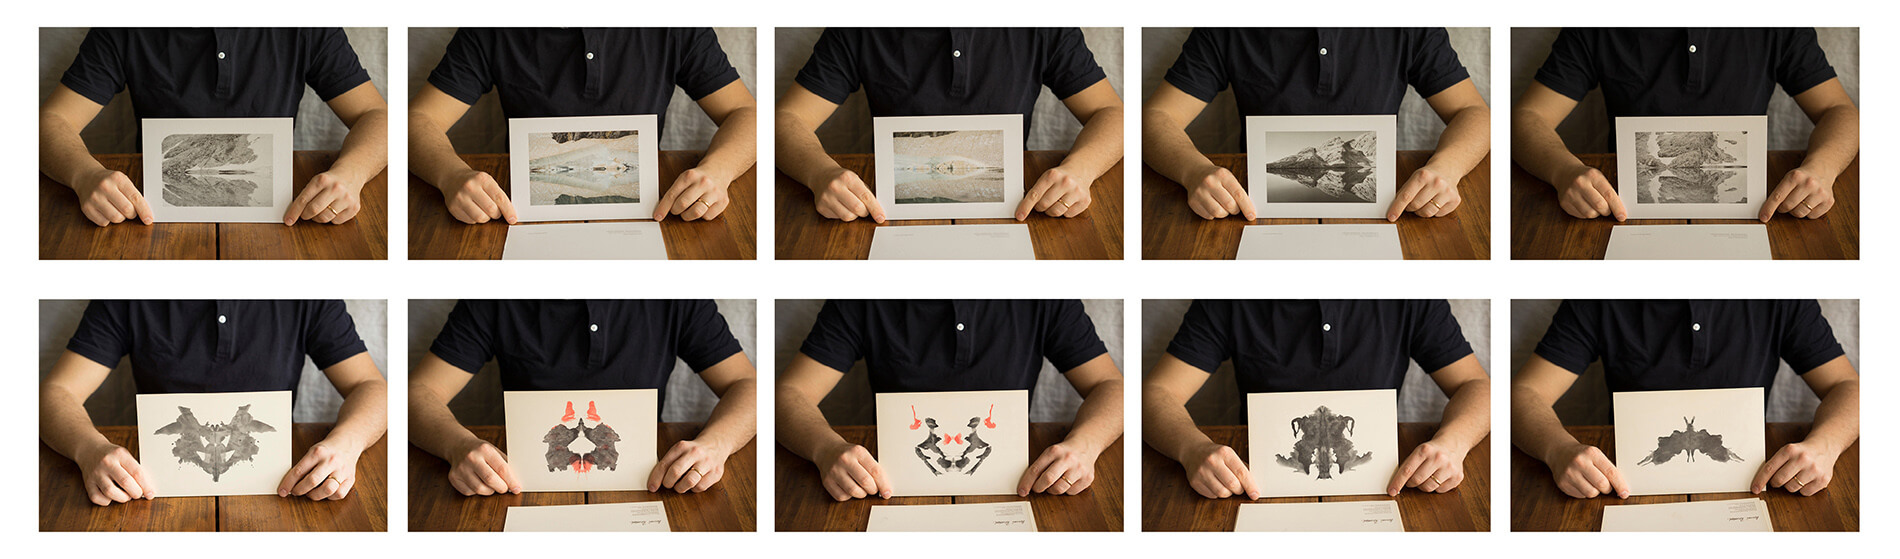 11 Fotodiagnostik Concept Davide Baldrati